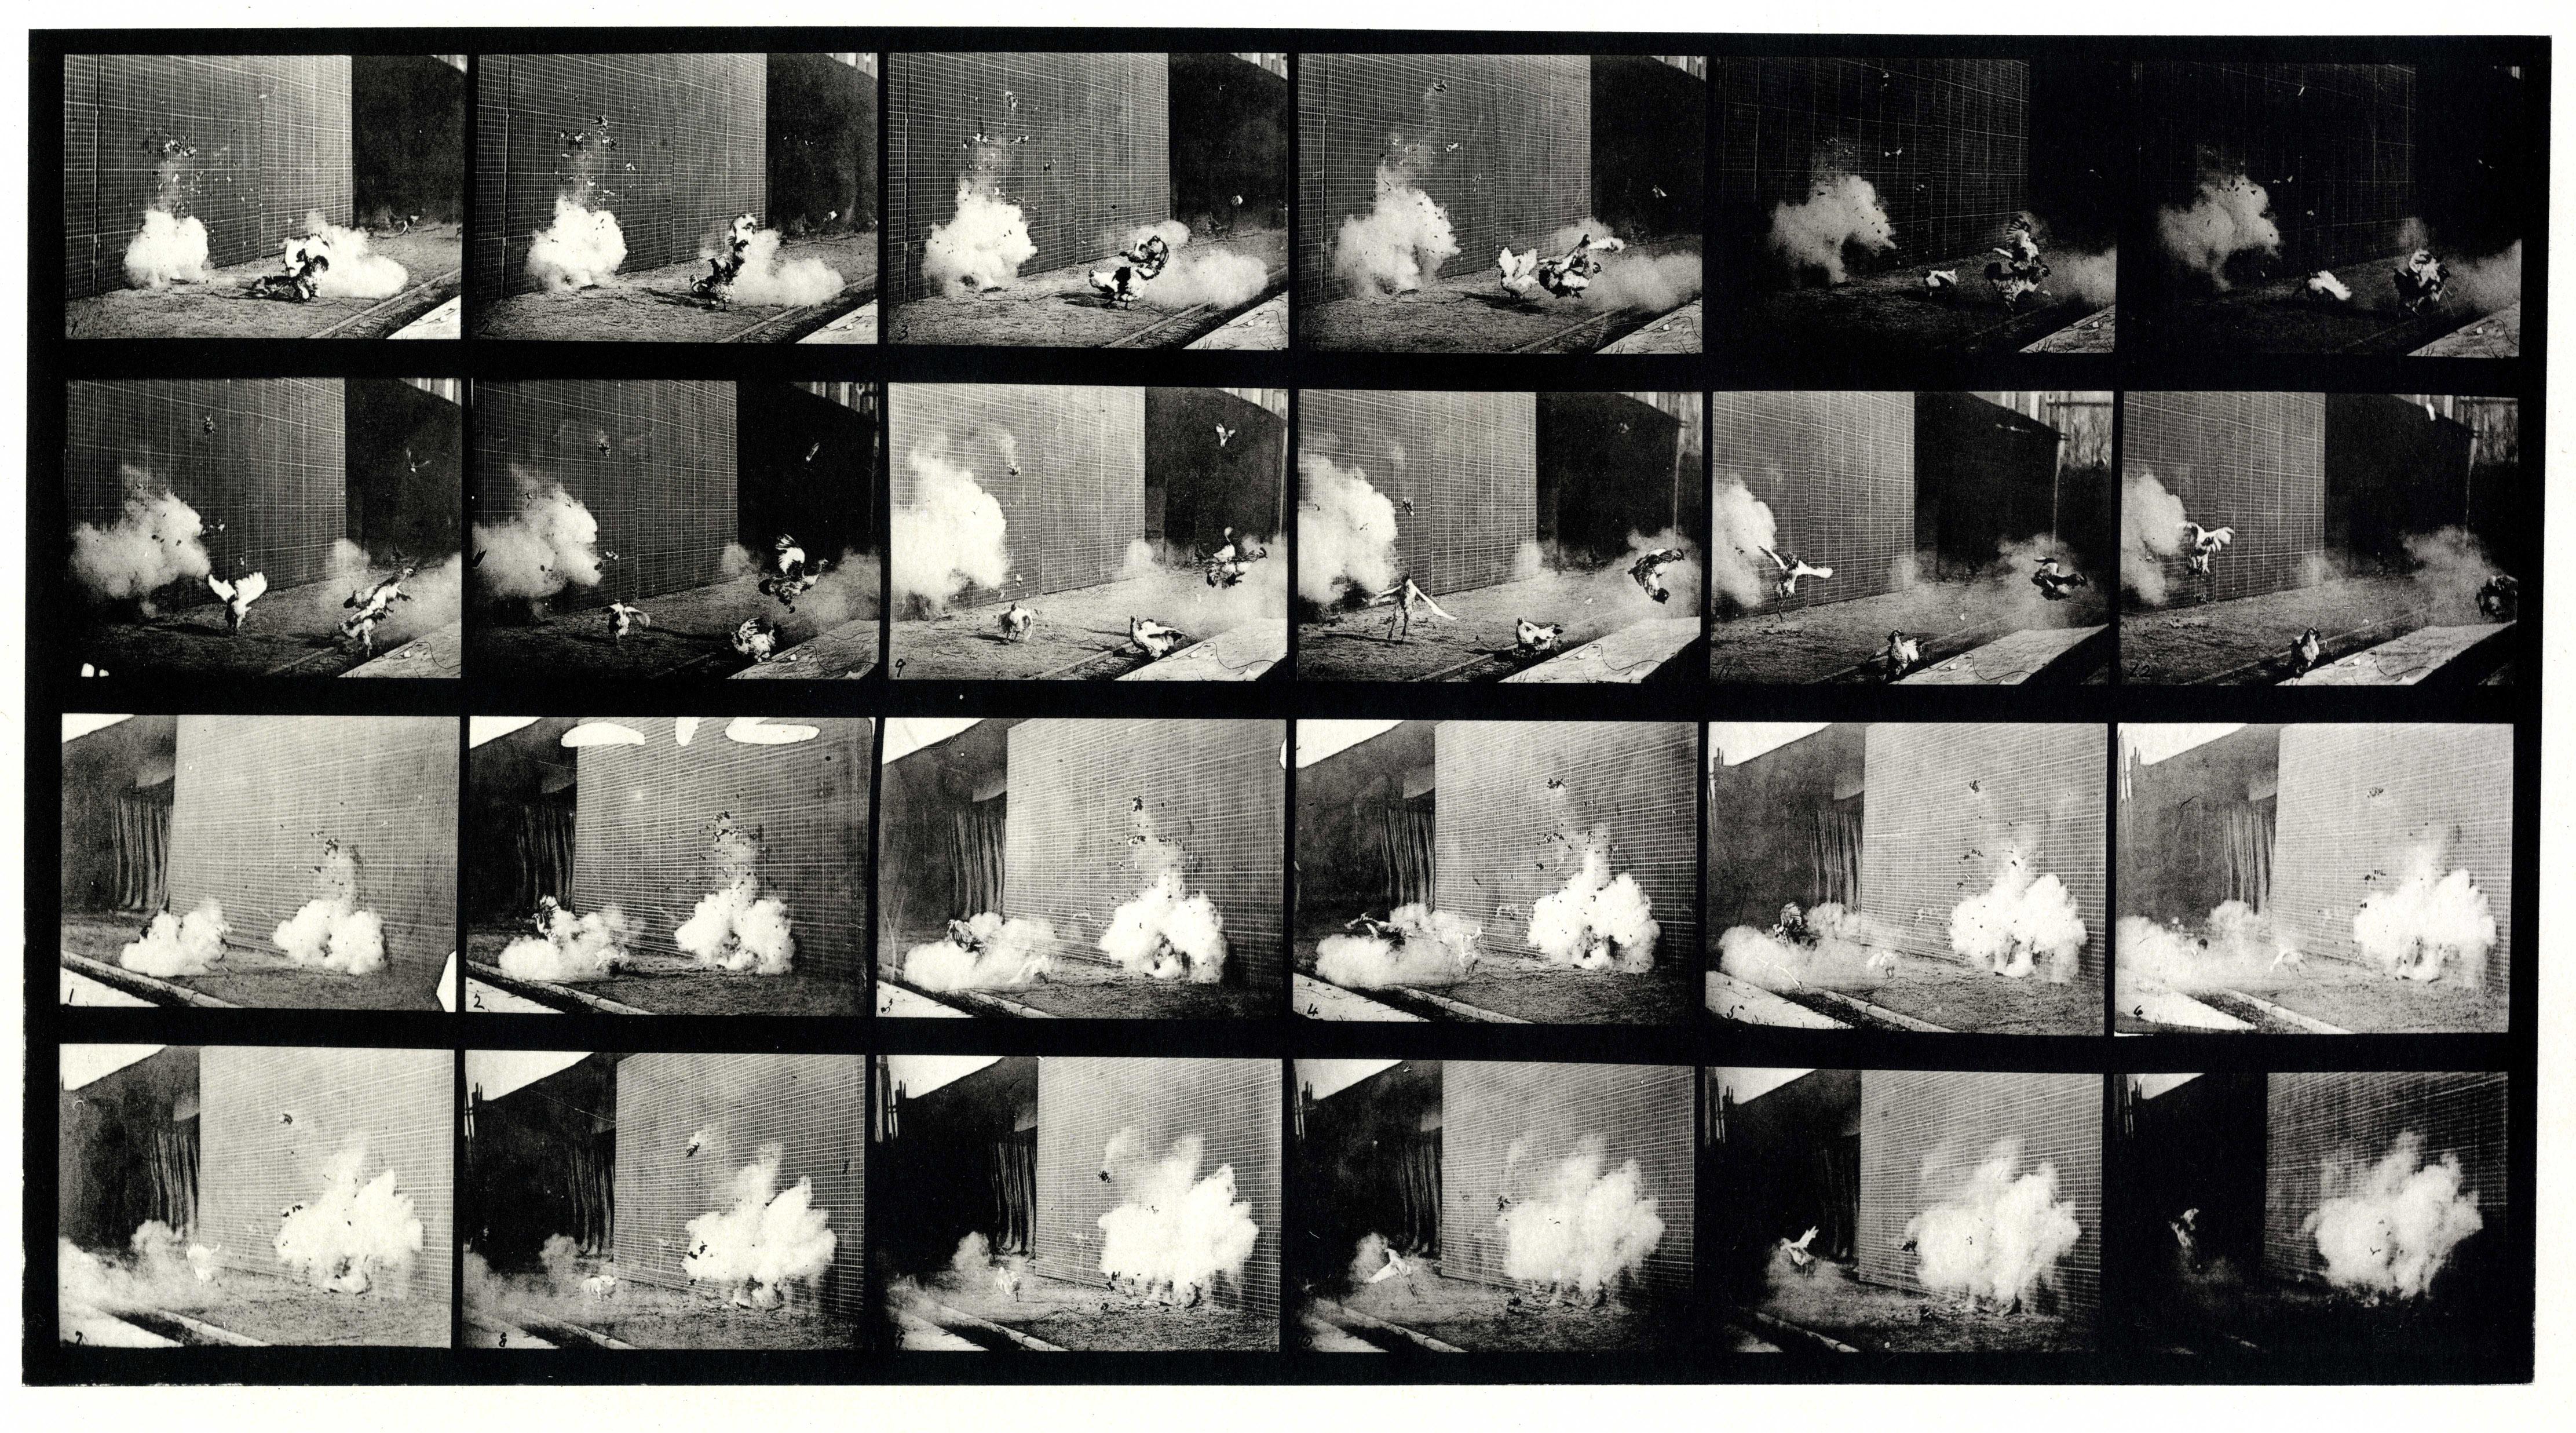 Exploding torpedo, Eadweard Muybridge. Image courtesy Laurence Miller Gallery